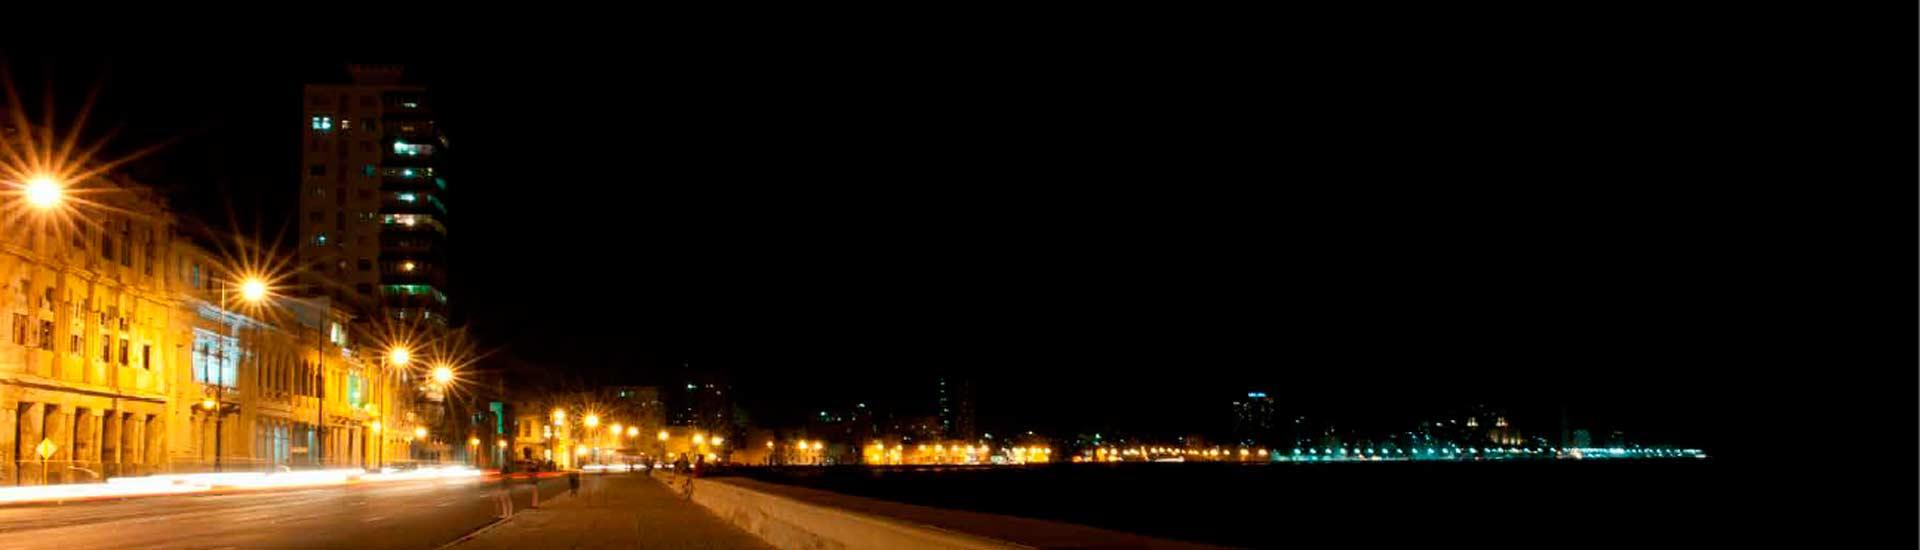 habana-nocturna